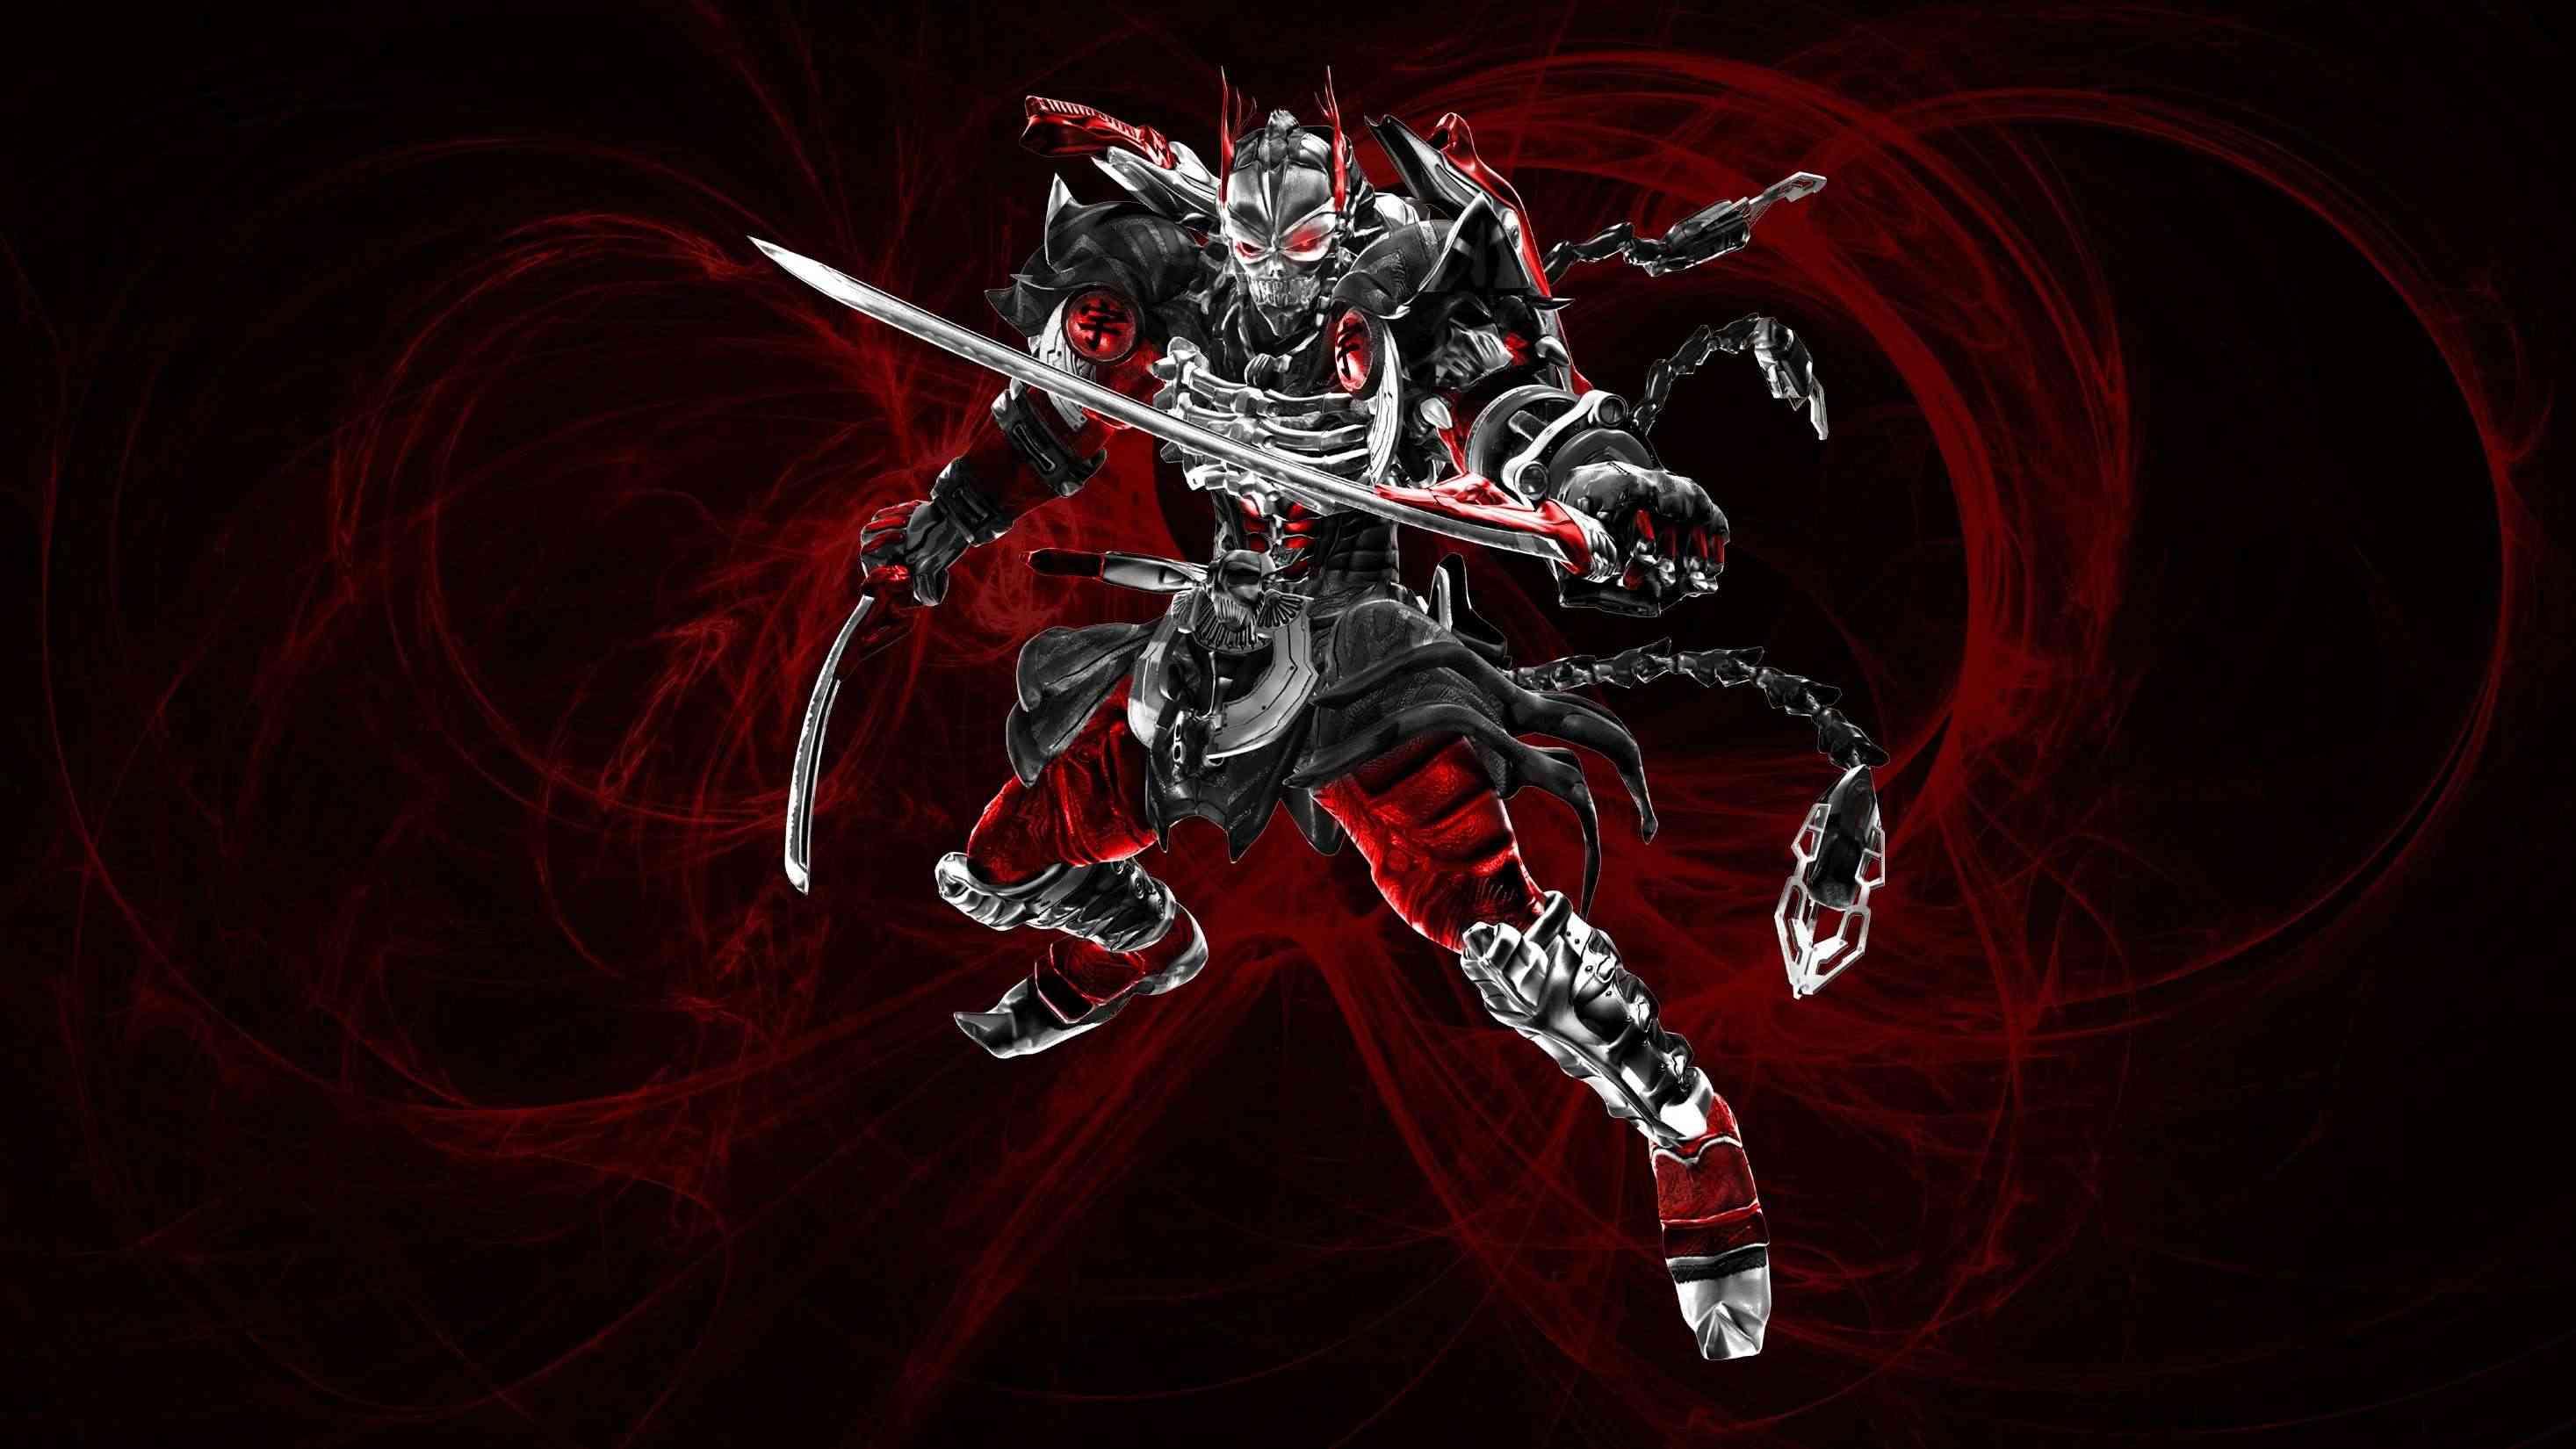 Yoshimitsu Tekken 6 Wallpaper The gallery for -->...